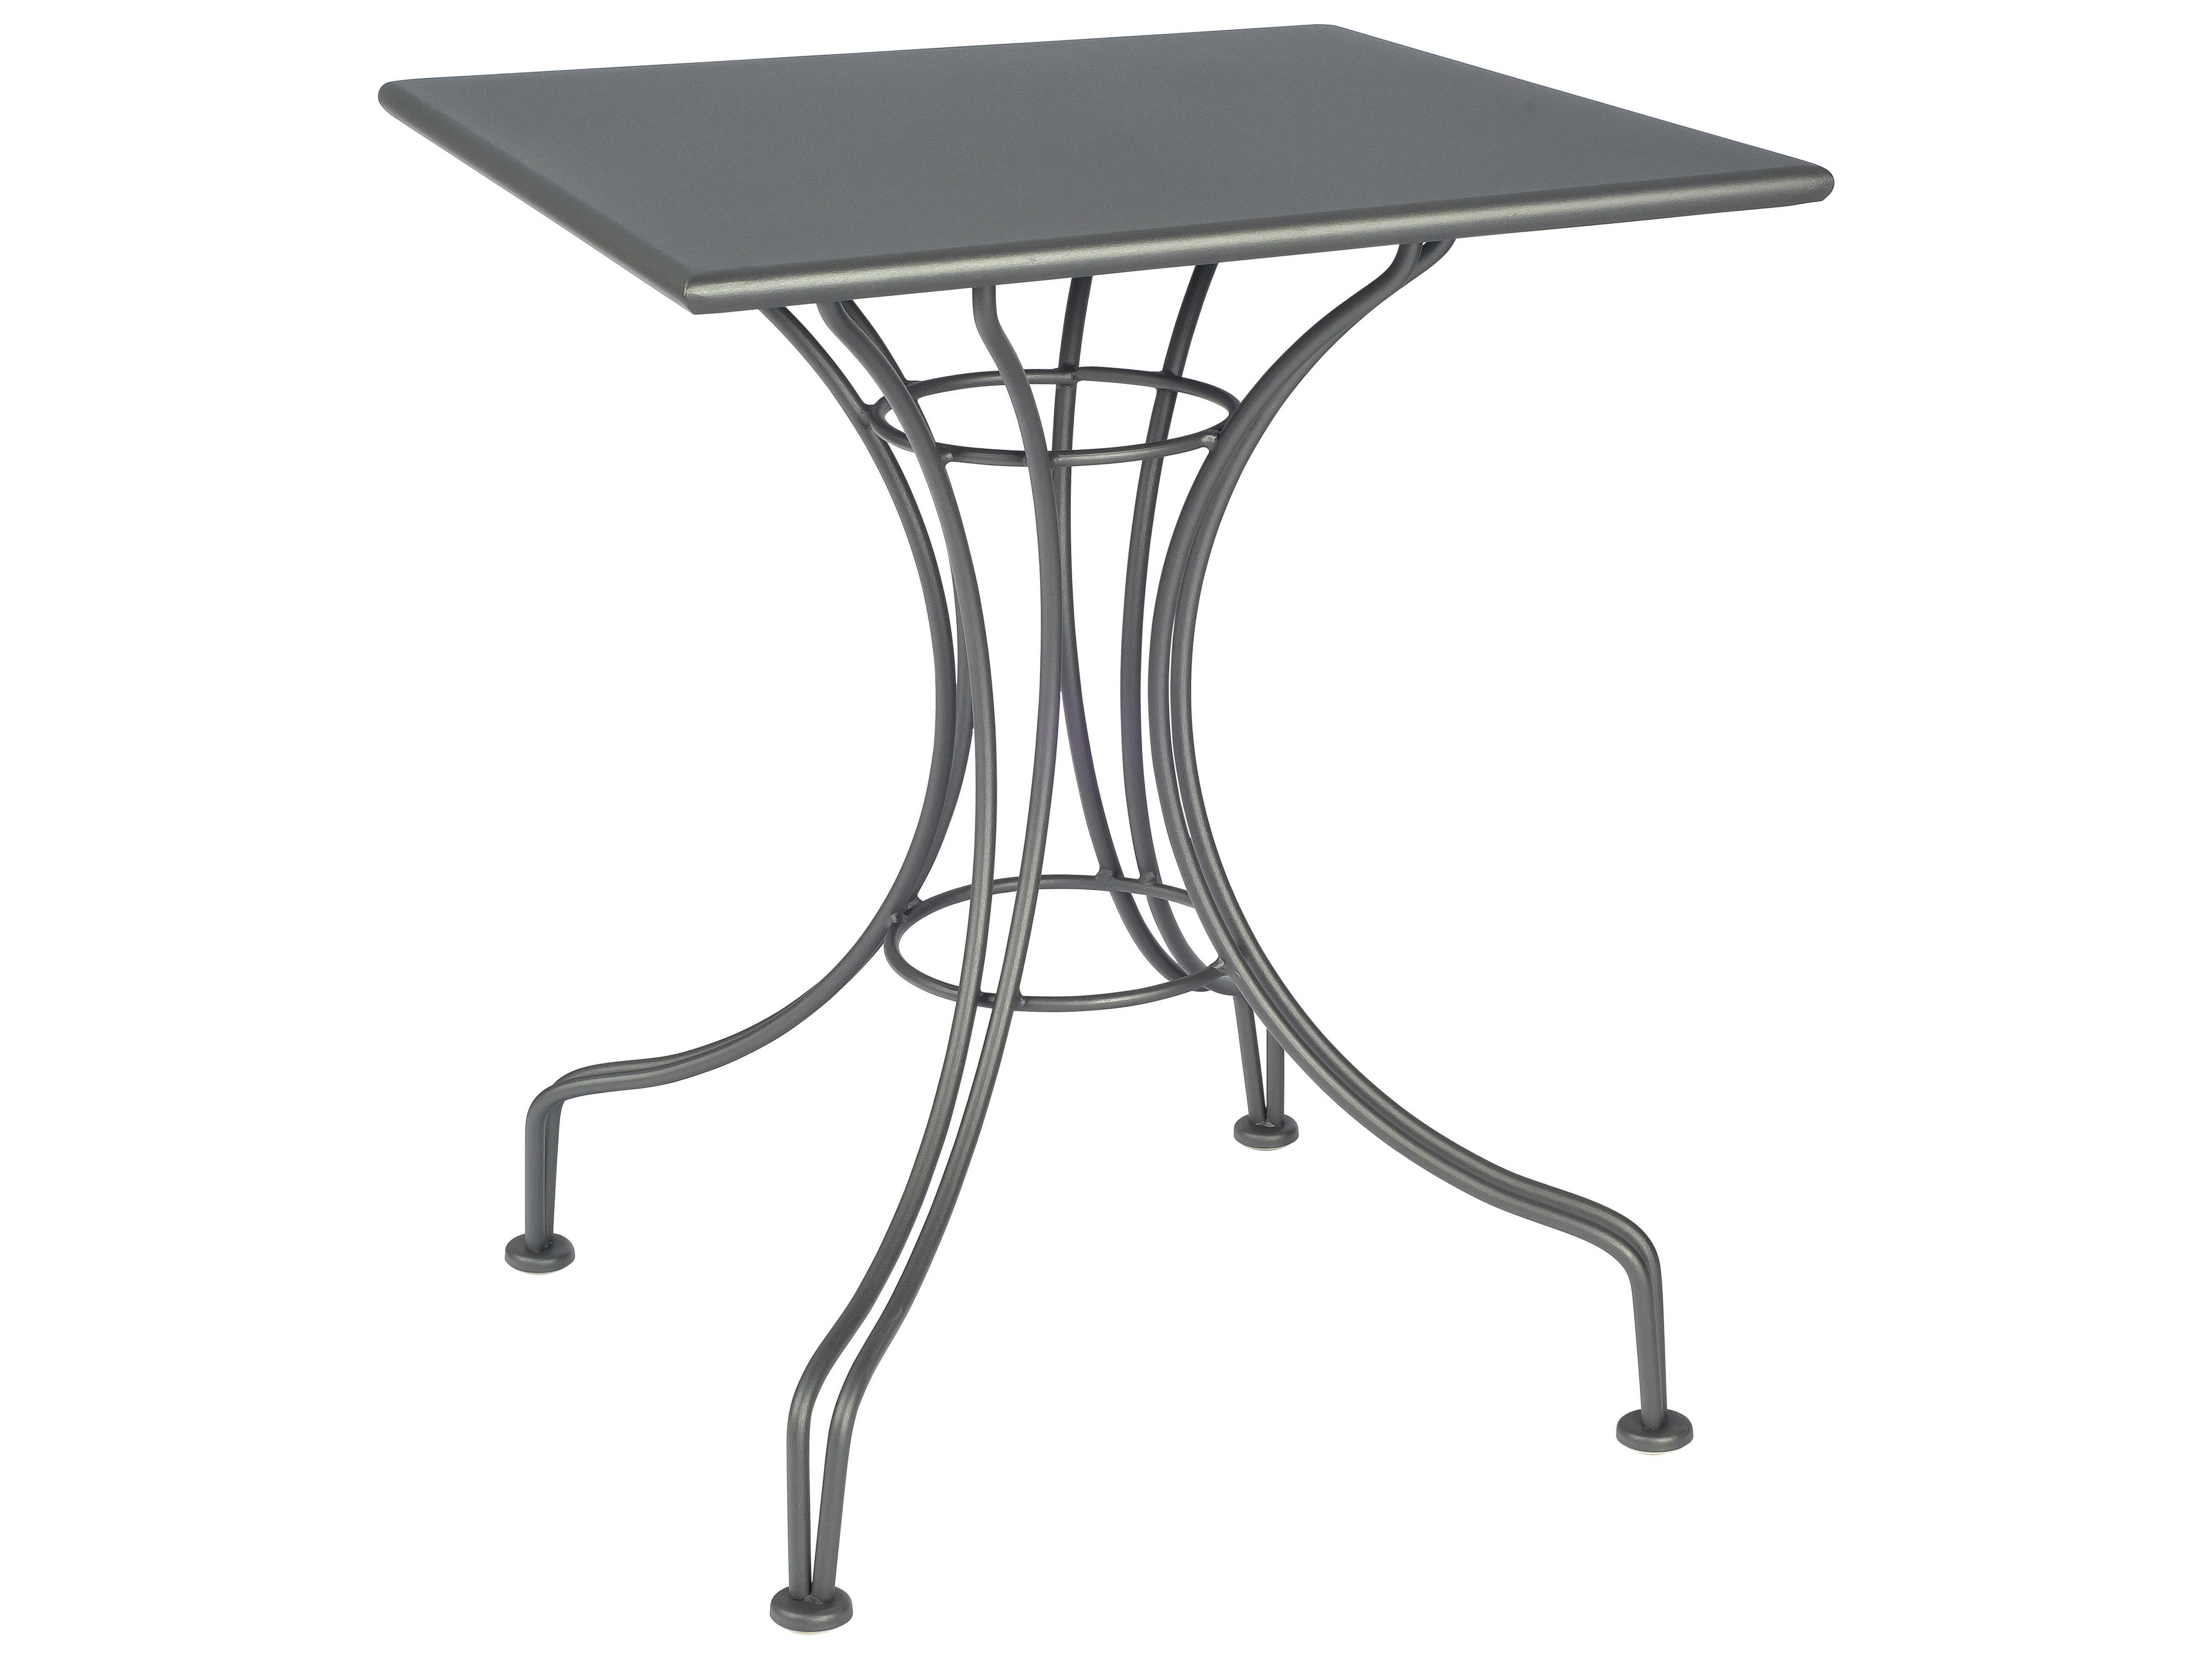 Woodard Wrought Iron 24 Square Bistro Table